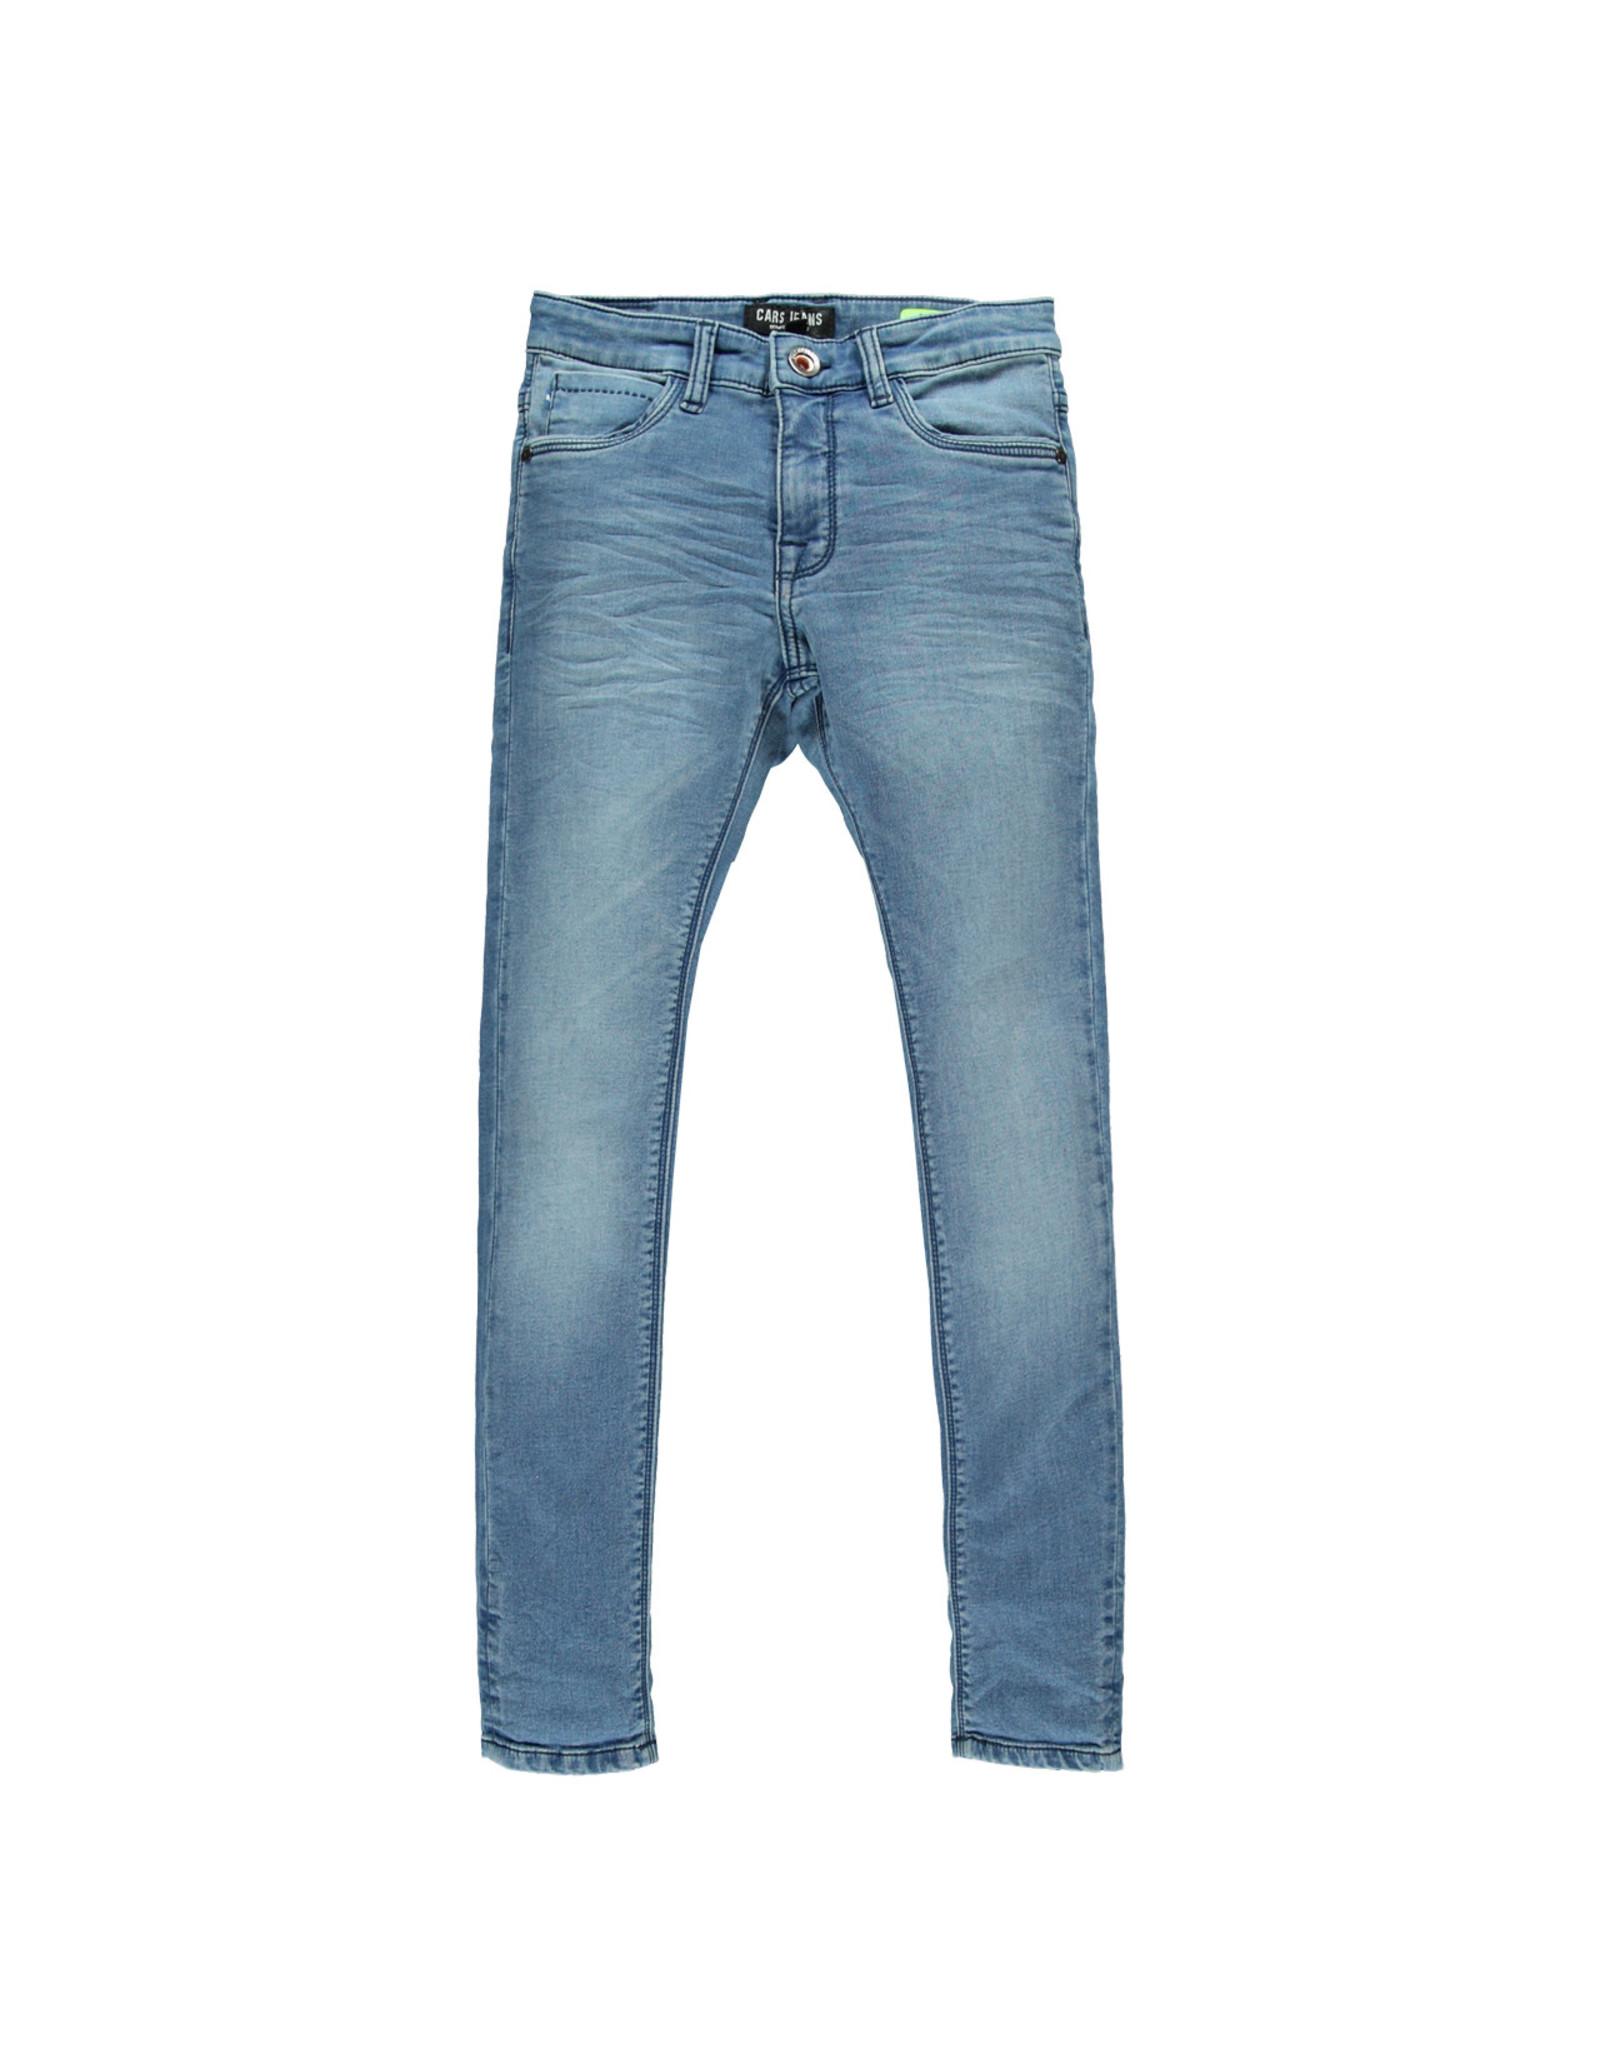 Cars Cars jongens jeans Aburgo Stone Used